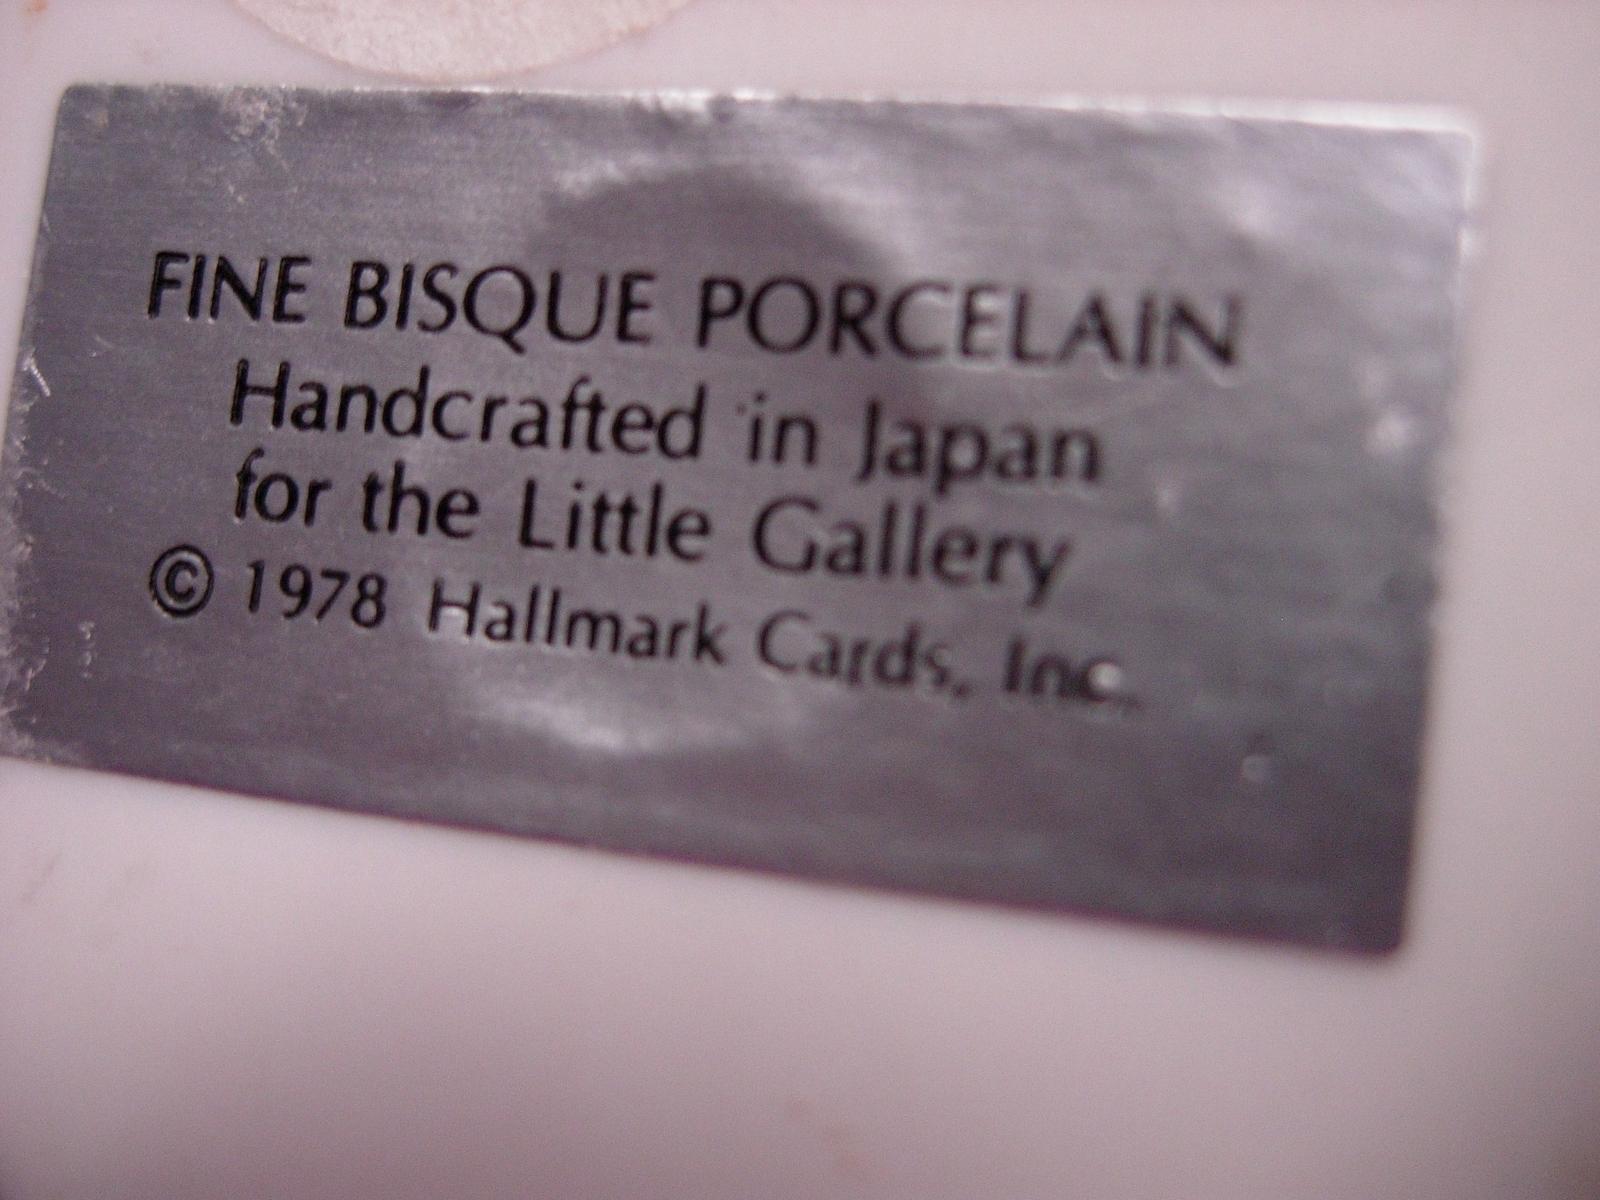 HALLMARK 1978 Little Gallery Bisque Mouse & Mushroom*